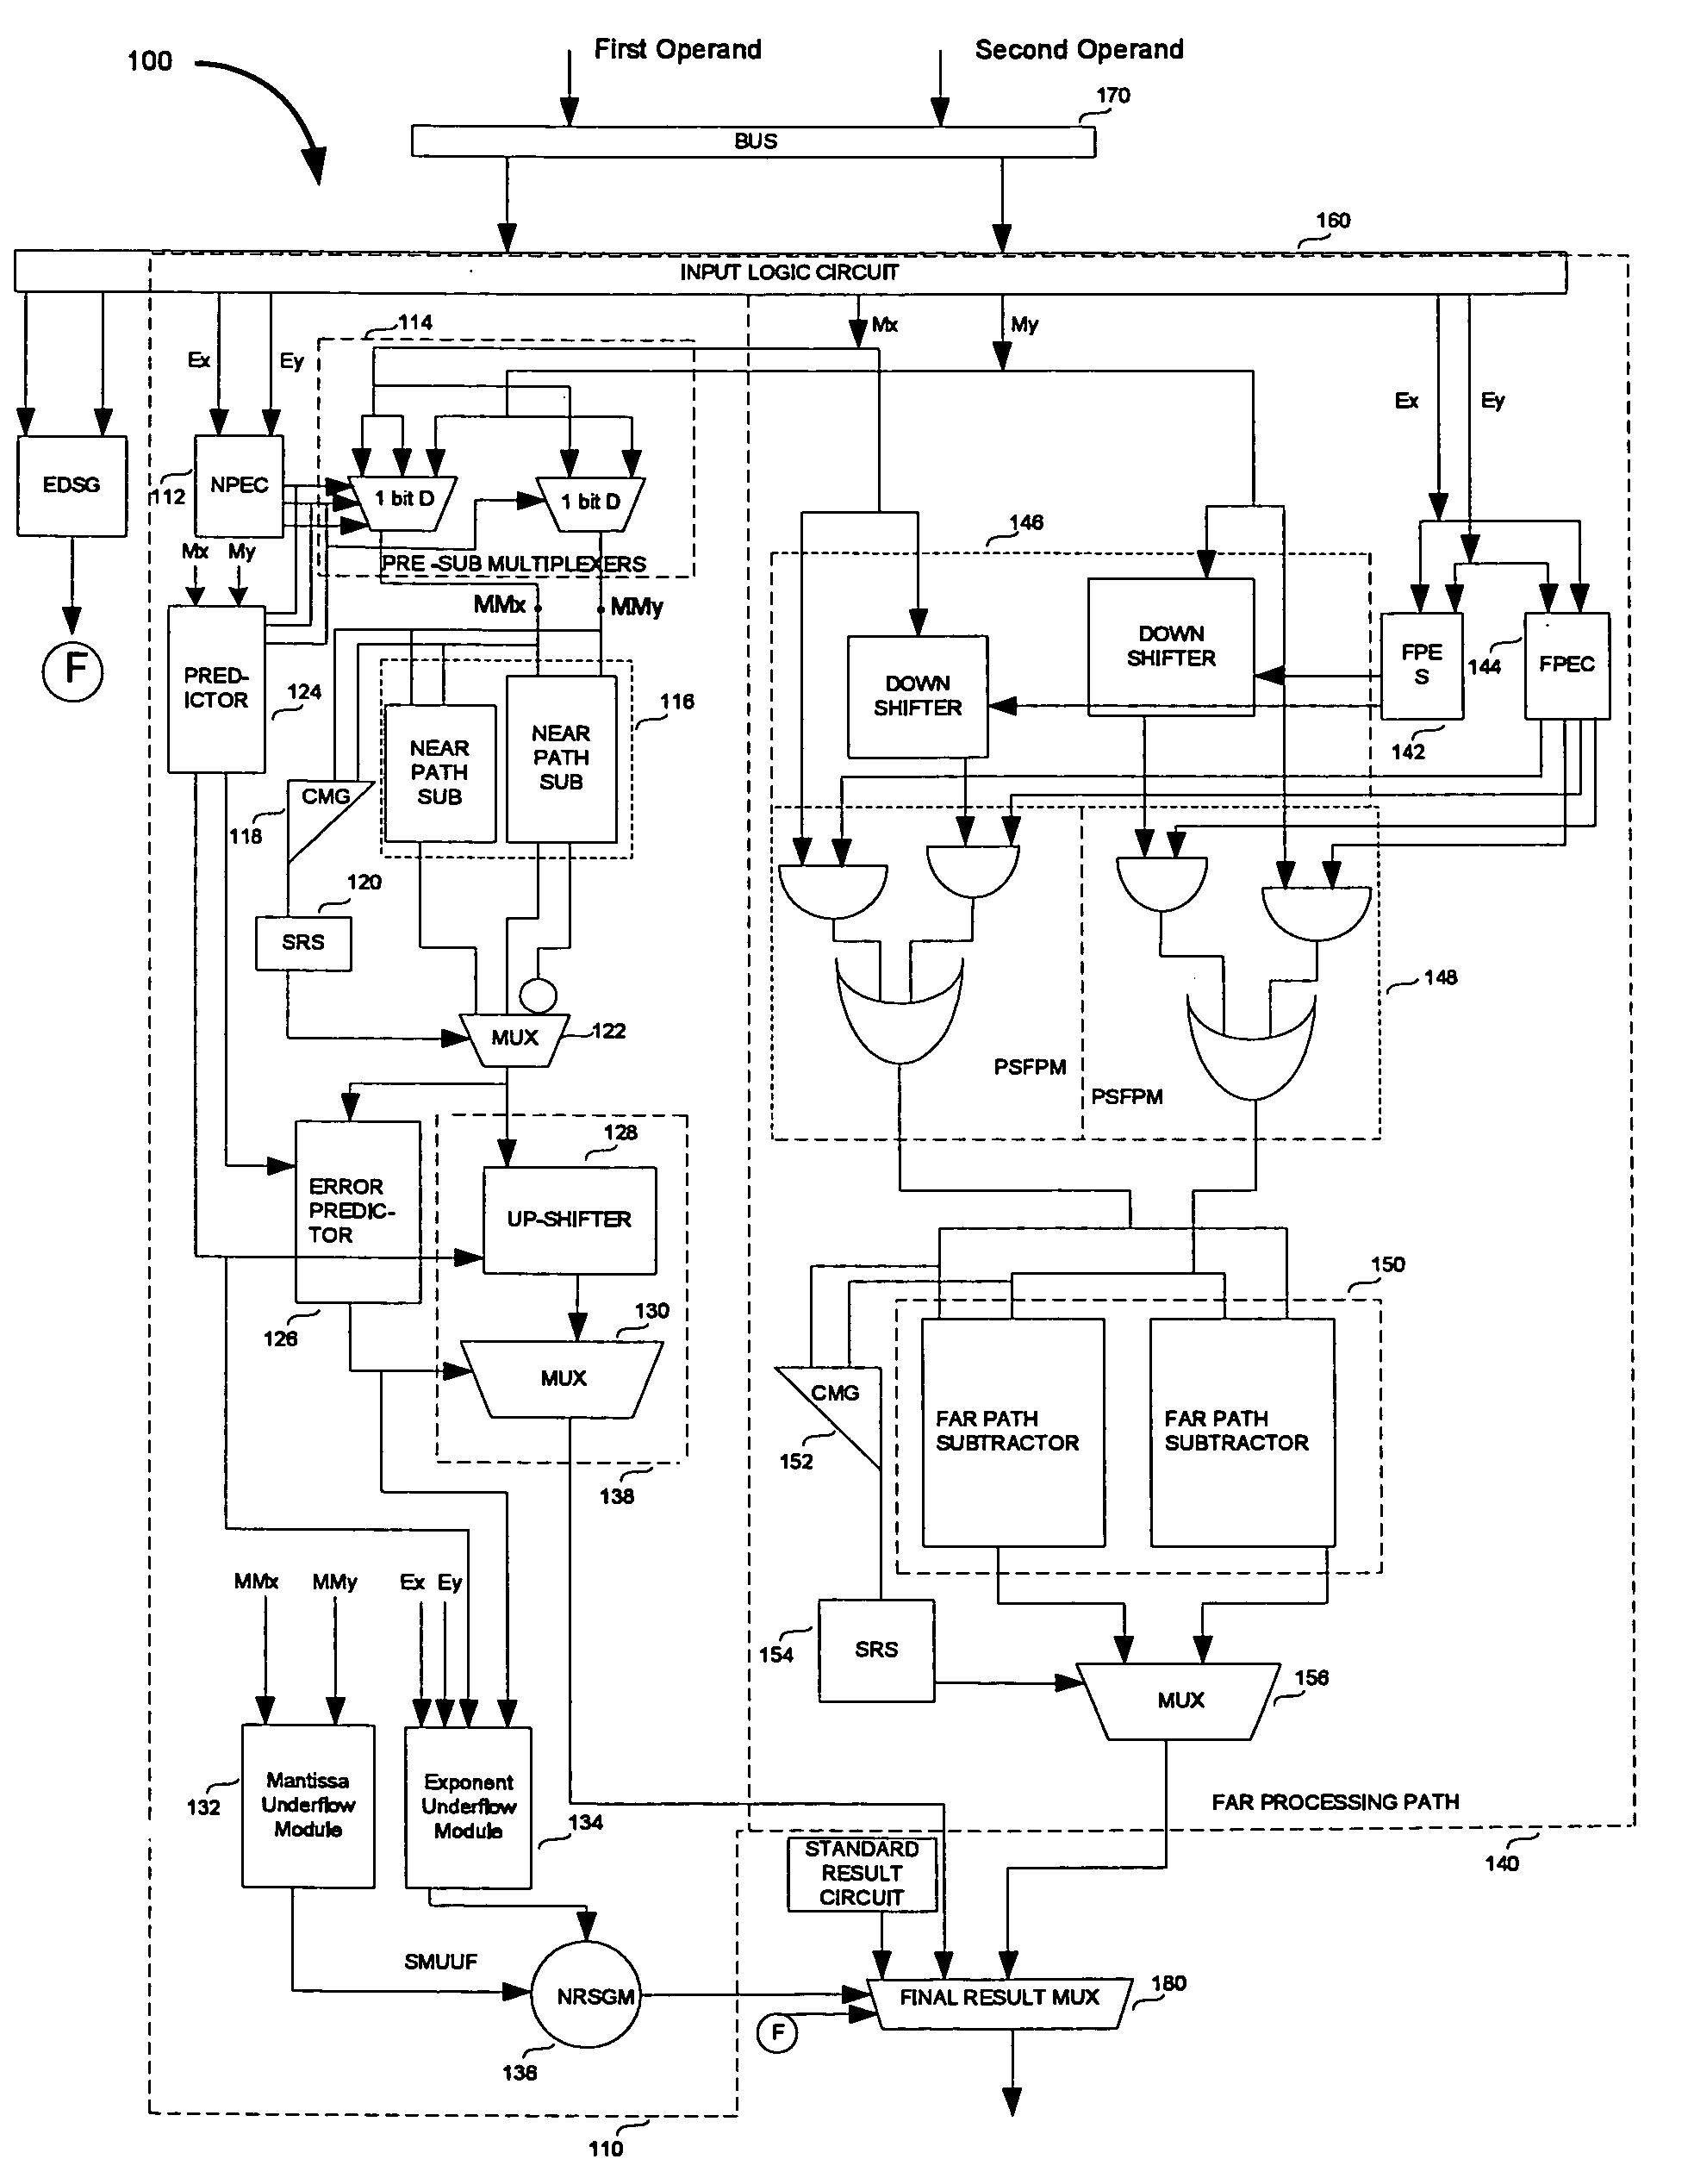 Brevet Us20060036667 Methods And Apparatus For An Efficient 1 Bit Alu Logic Diagram Patent Drawing